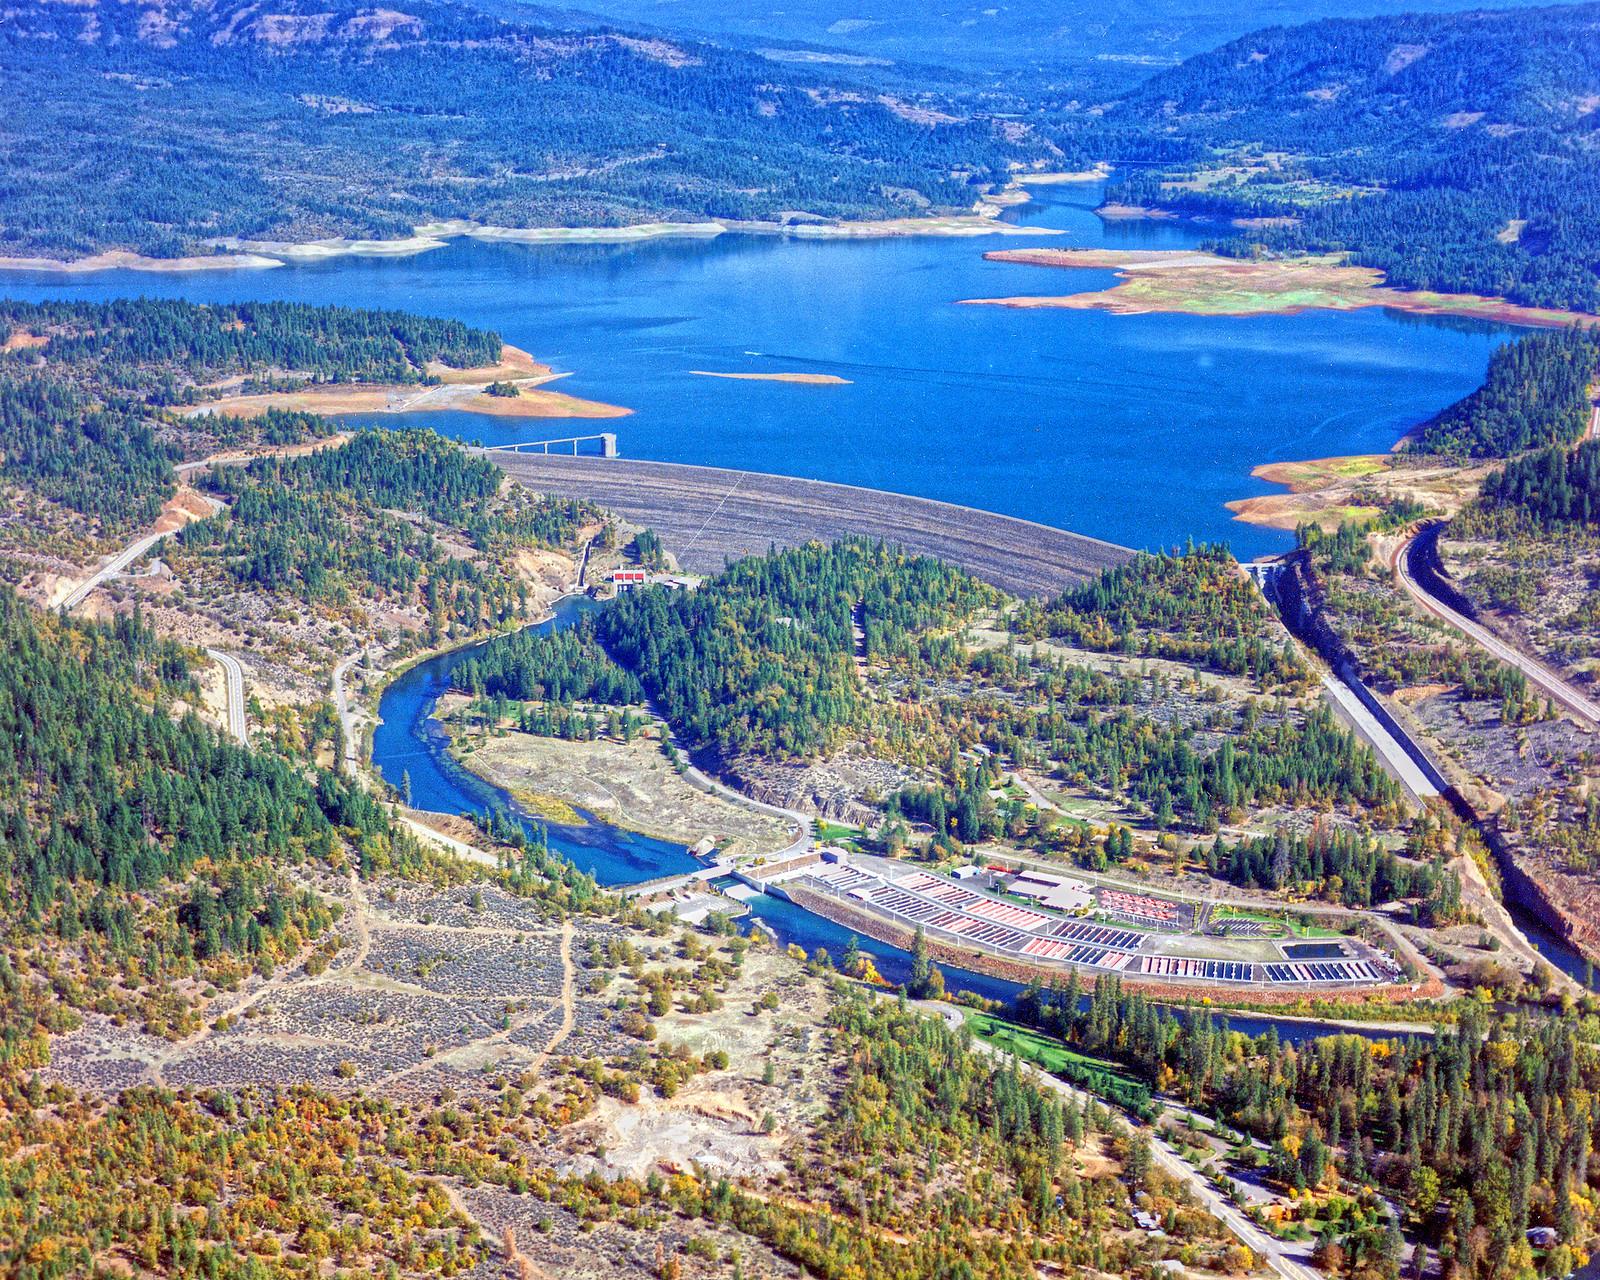 photo of Lost Creek dam